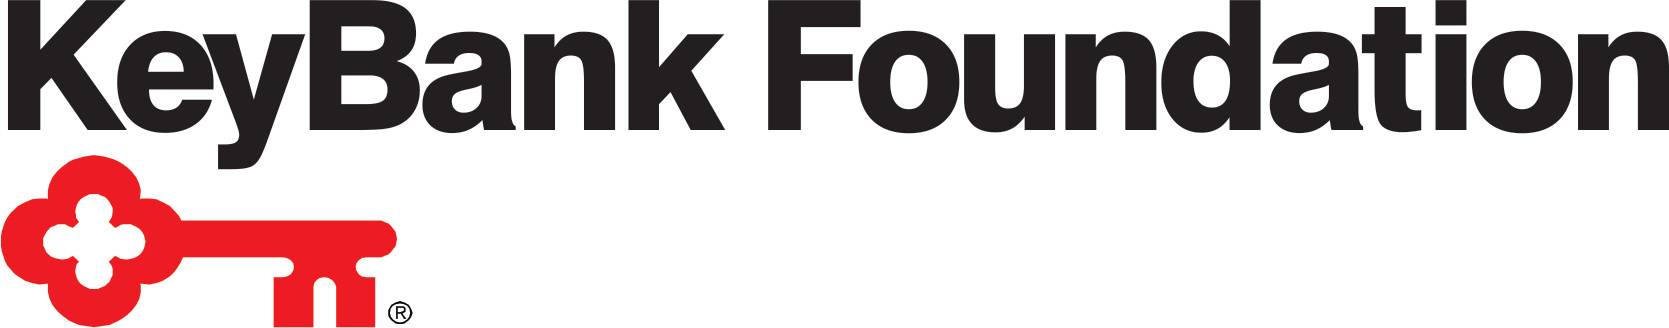 Key Bank Foundation